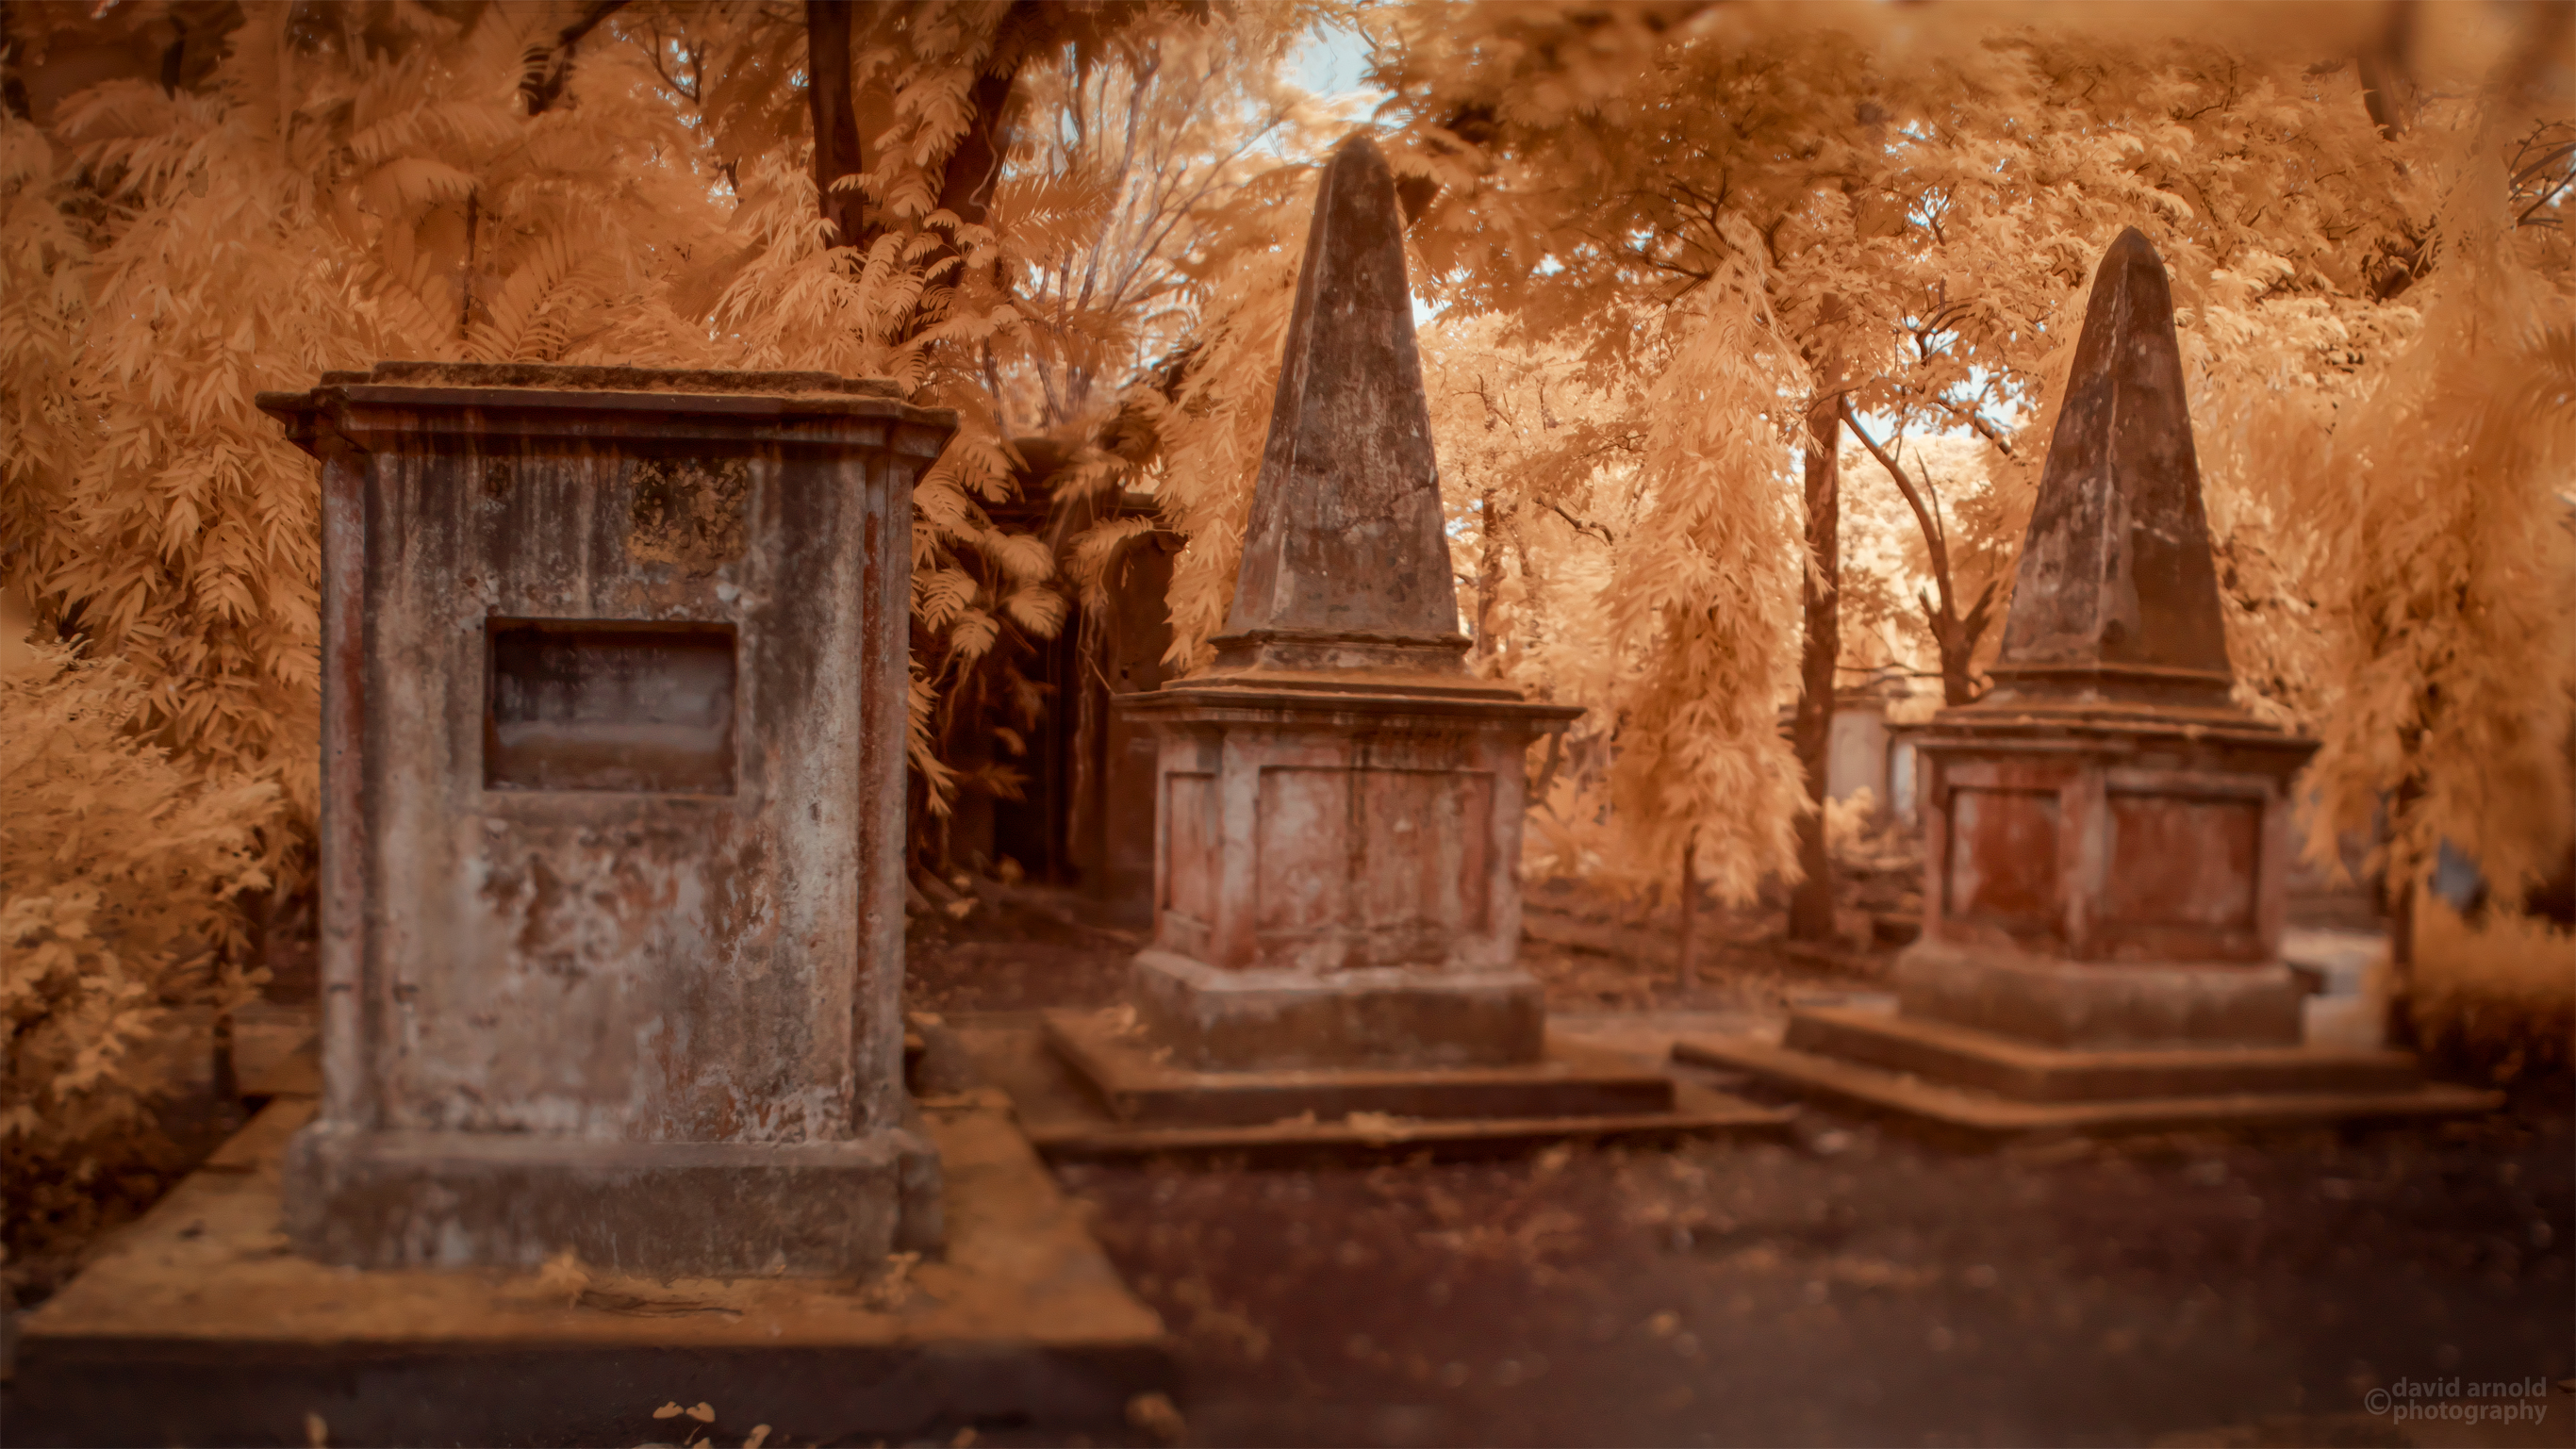 Tomb, Pyramids, South Park Street Cemetery, Kolkata, India.